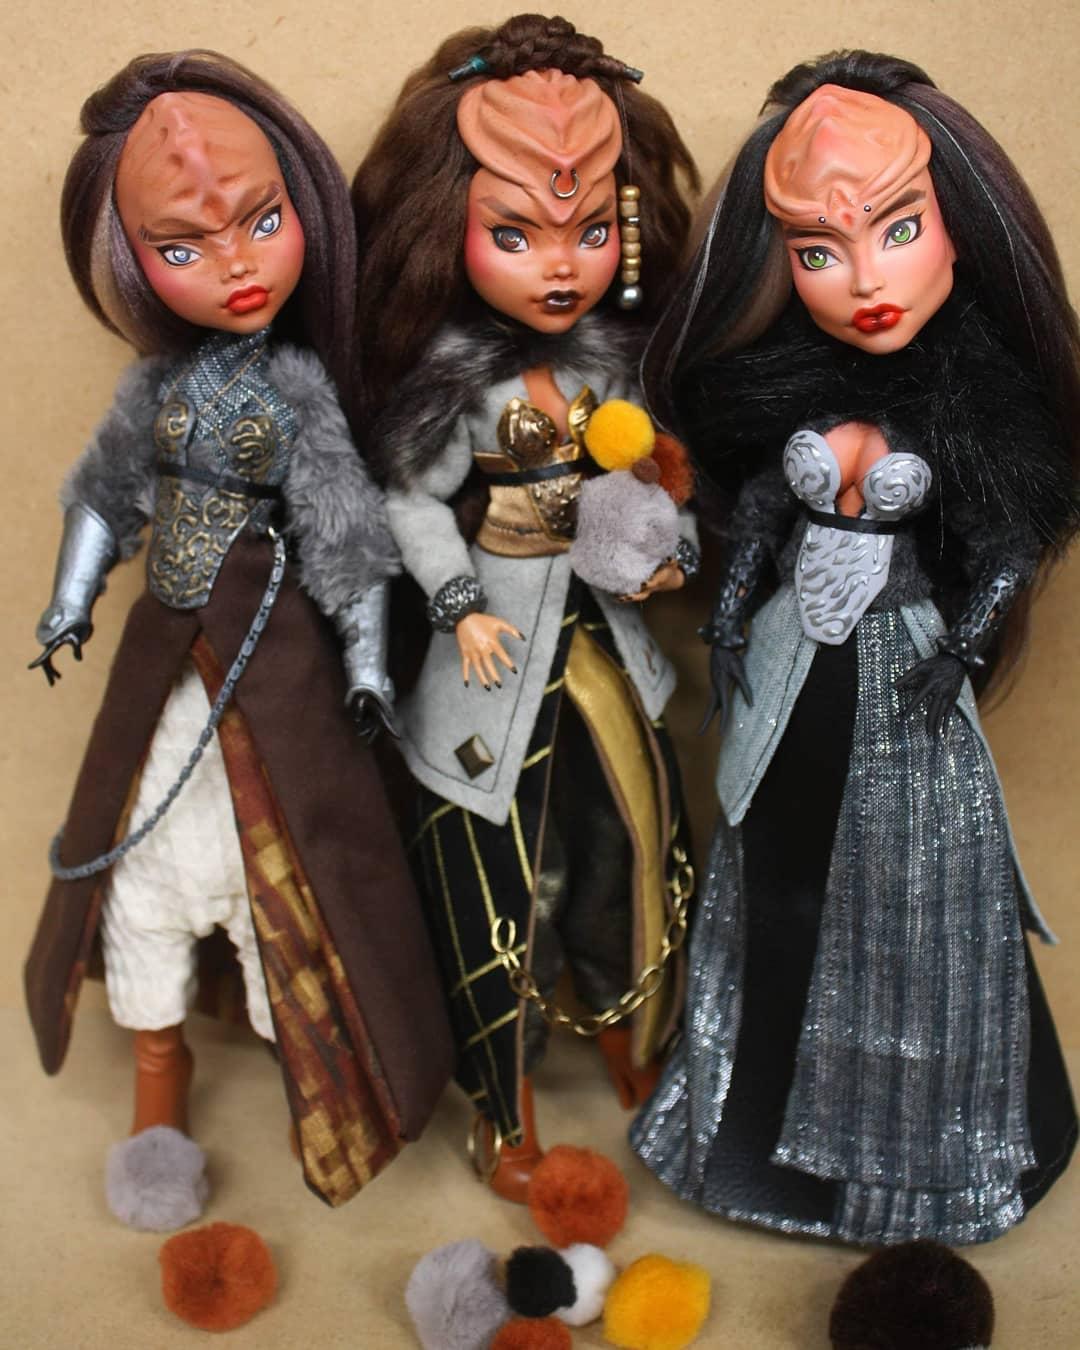 Custom Geek Pop Culture Dolls